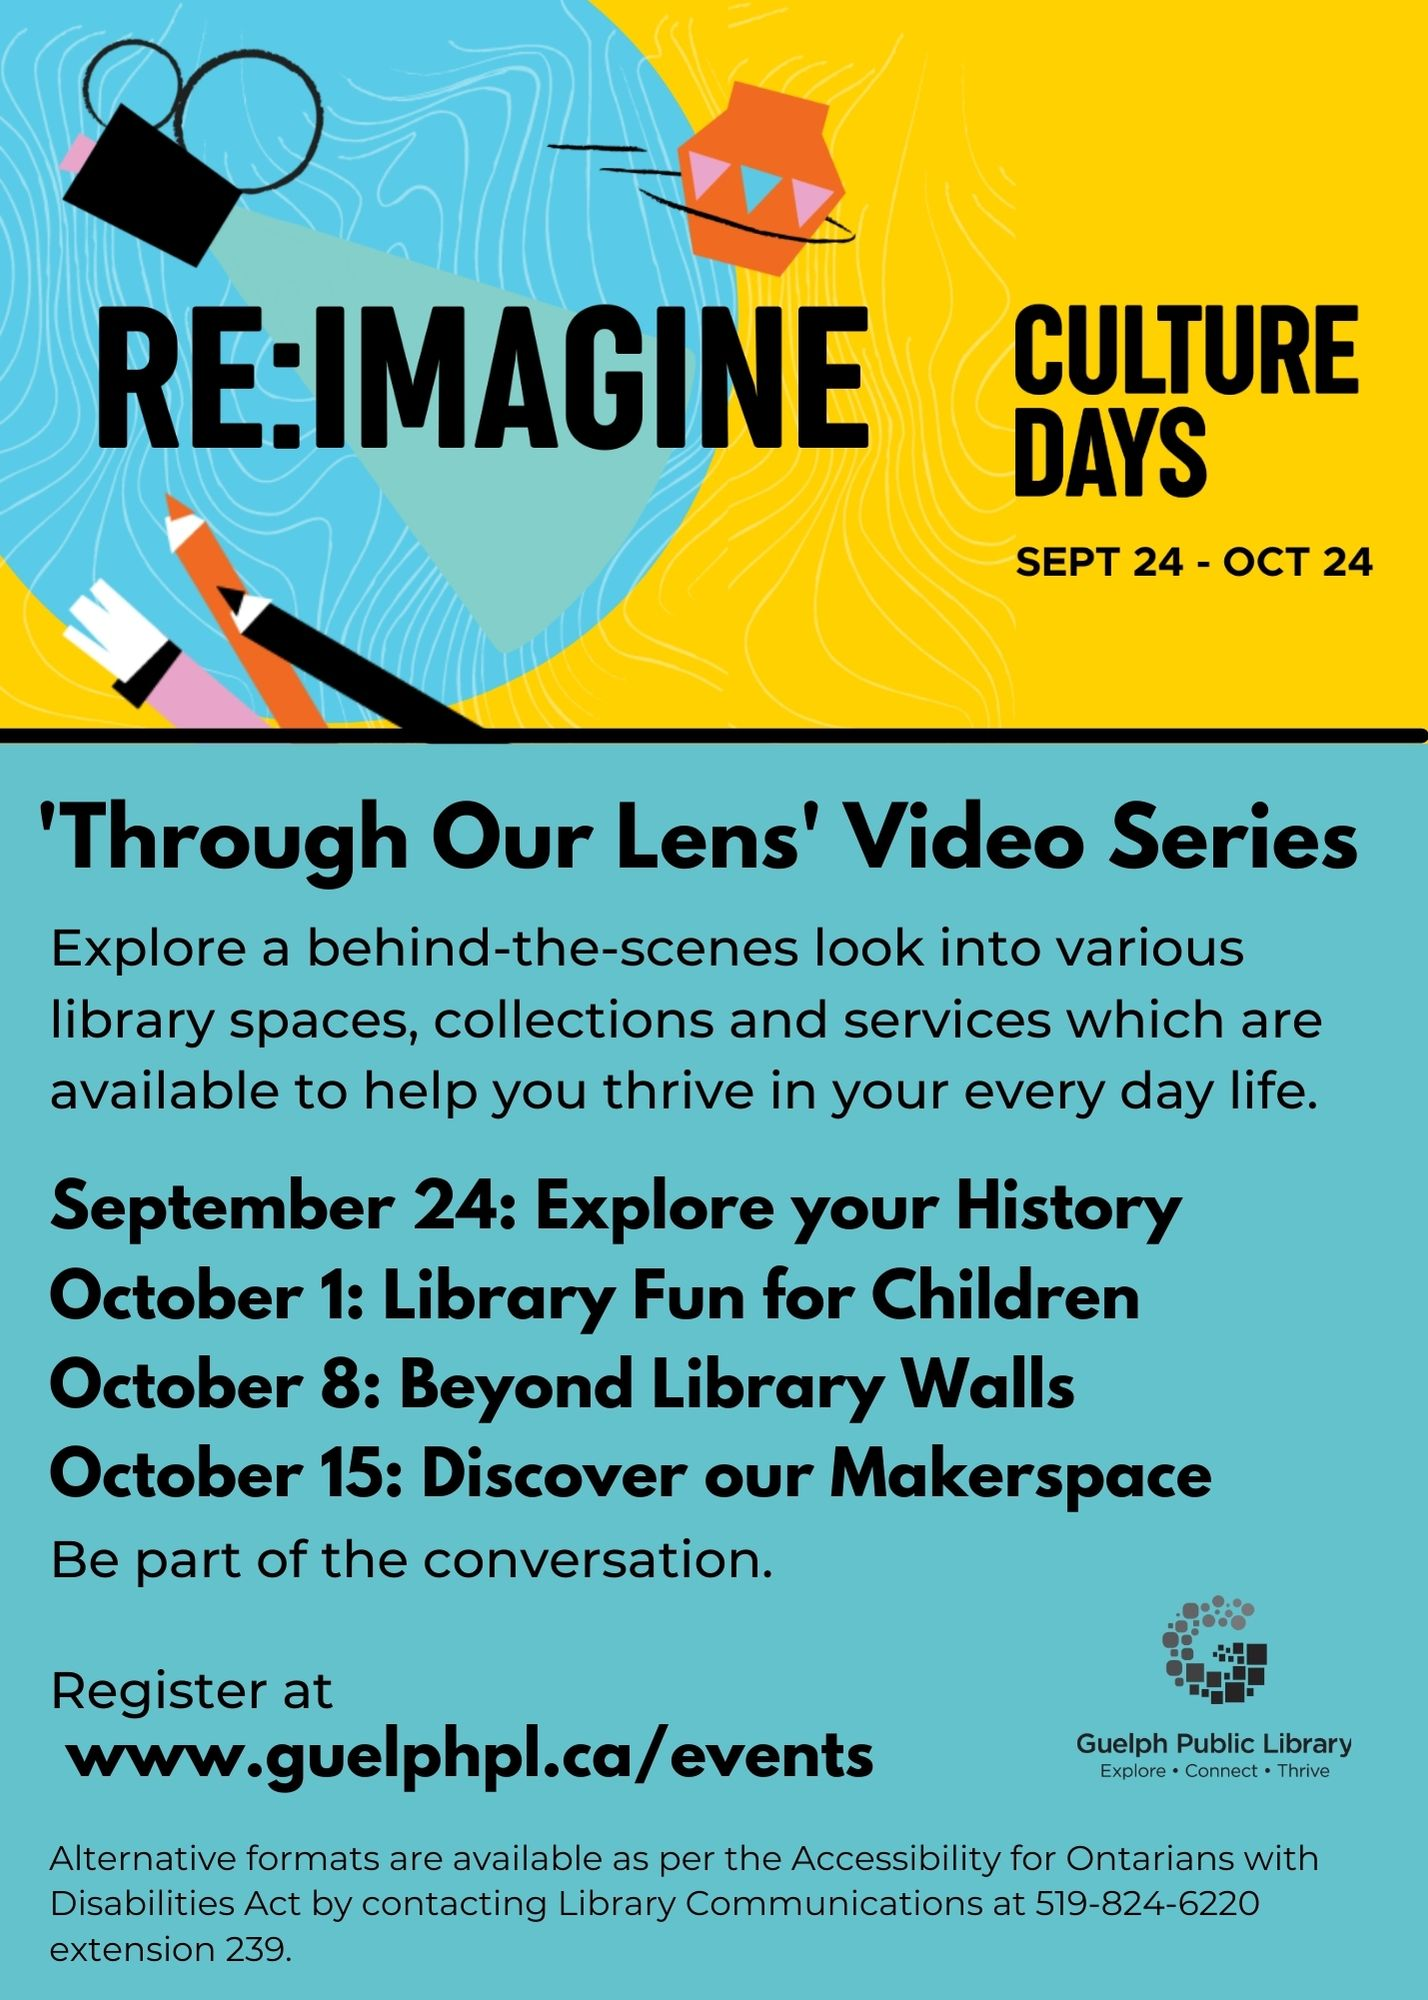 Culture Days 2021 Through Our Lens